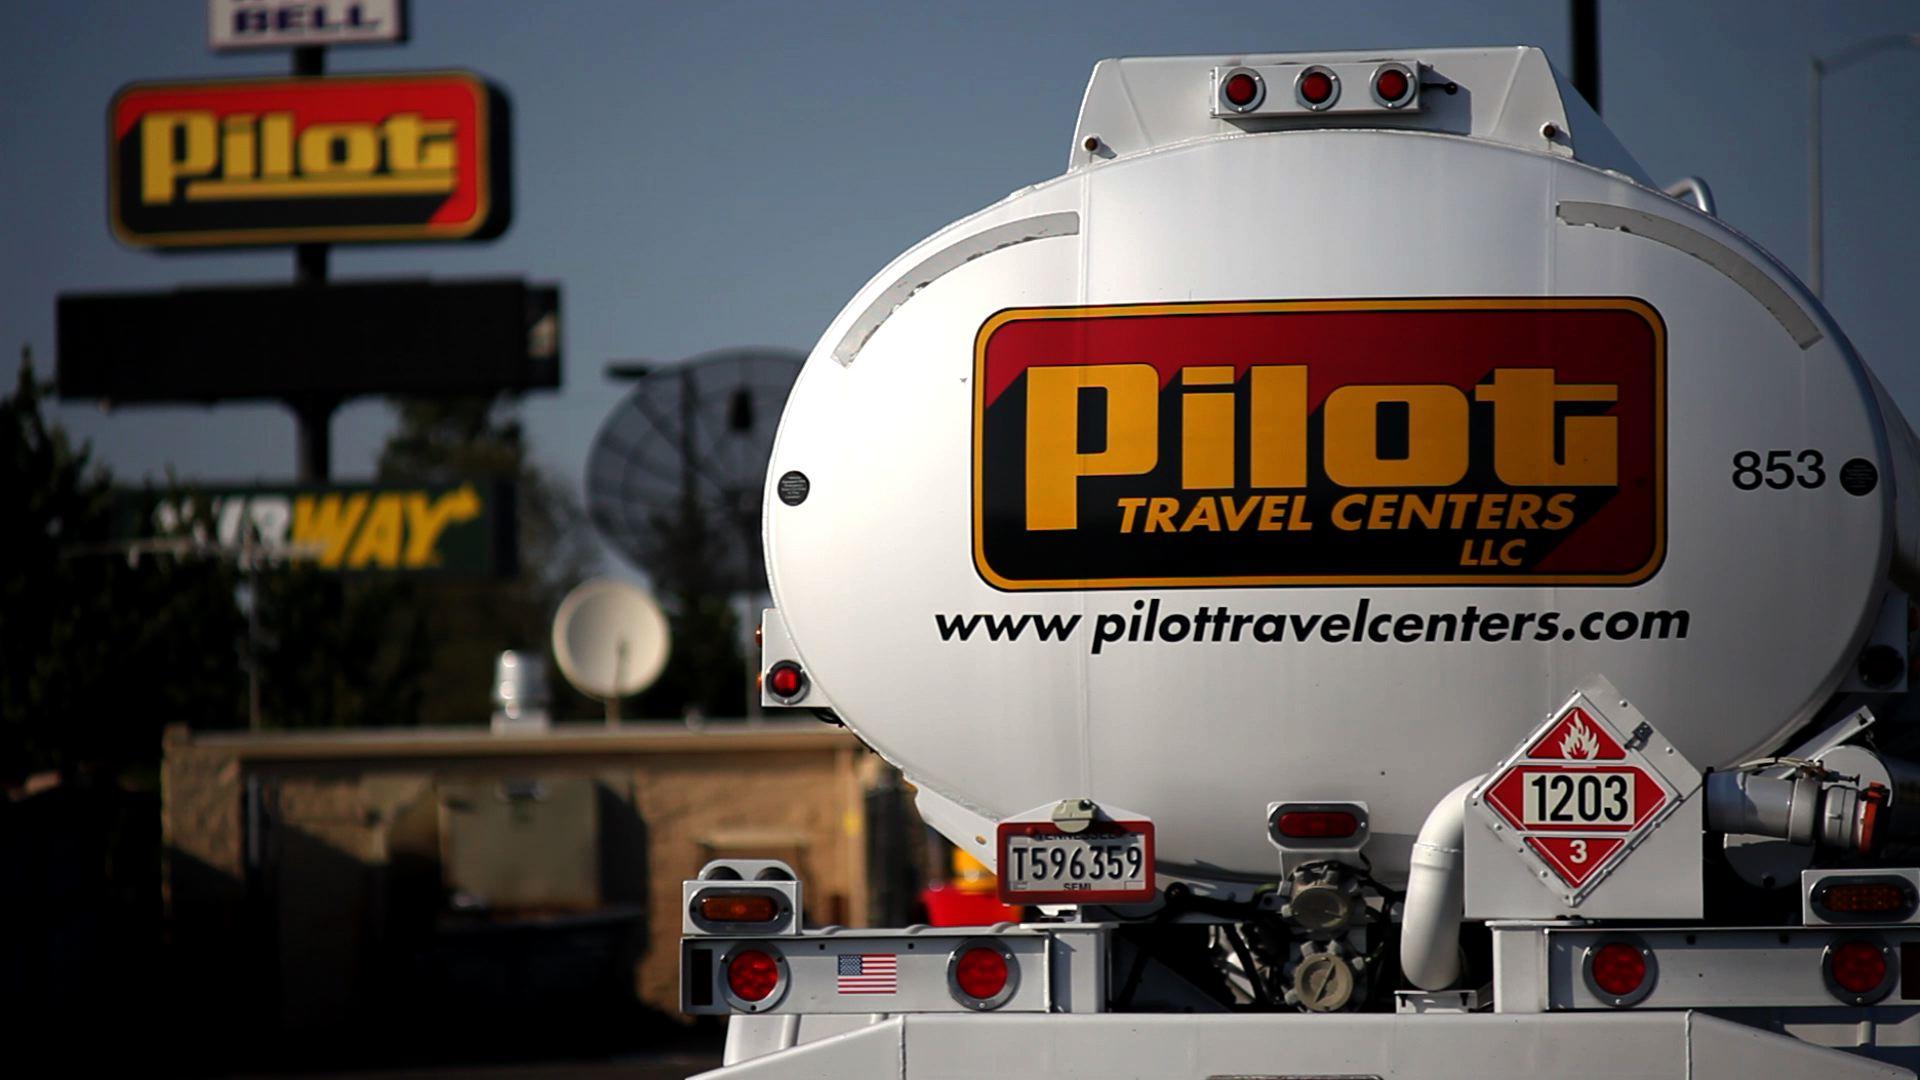 Former FBI Director to Investigate Pilot Flying J as Part of Lawsuit